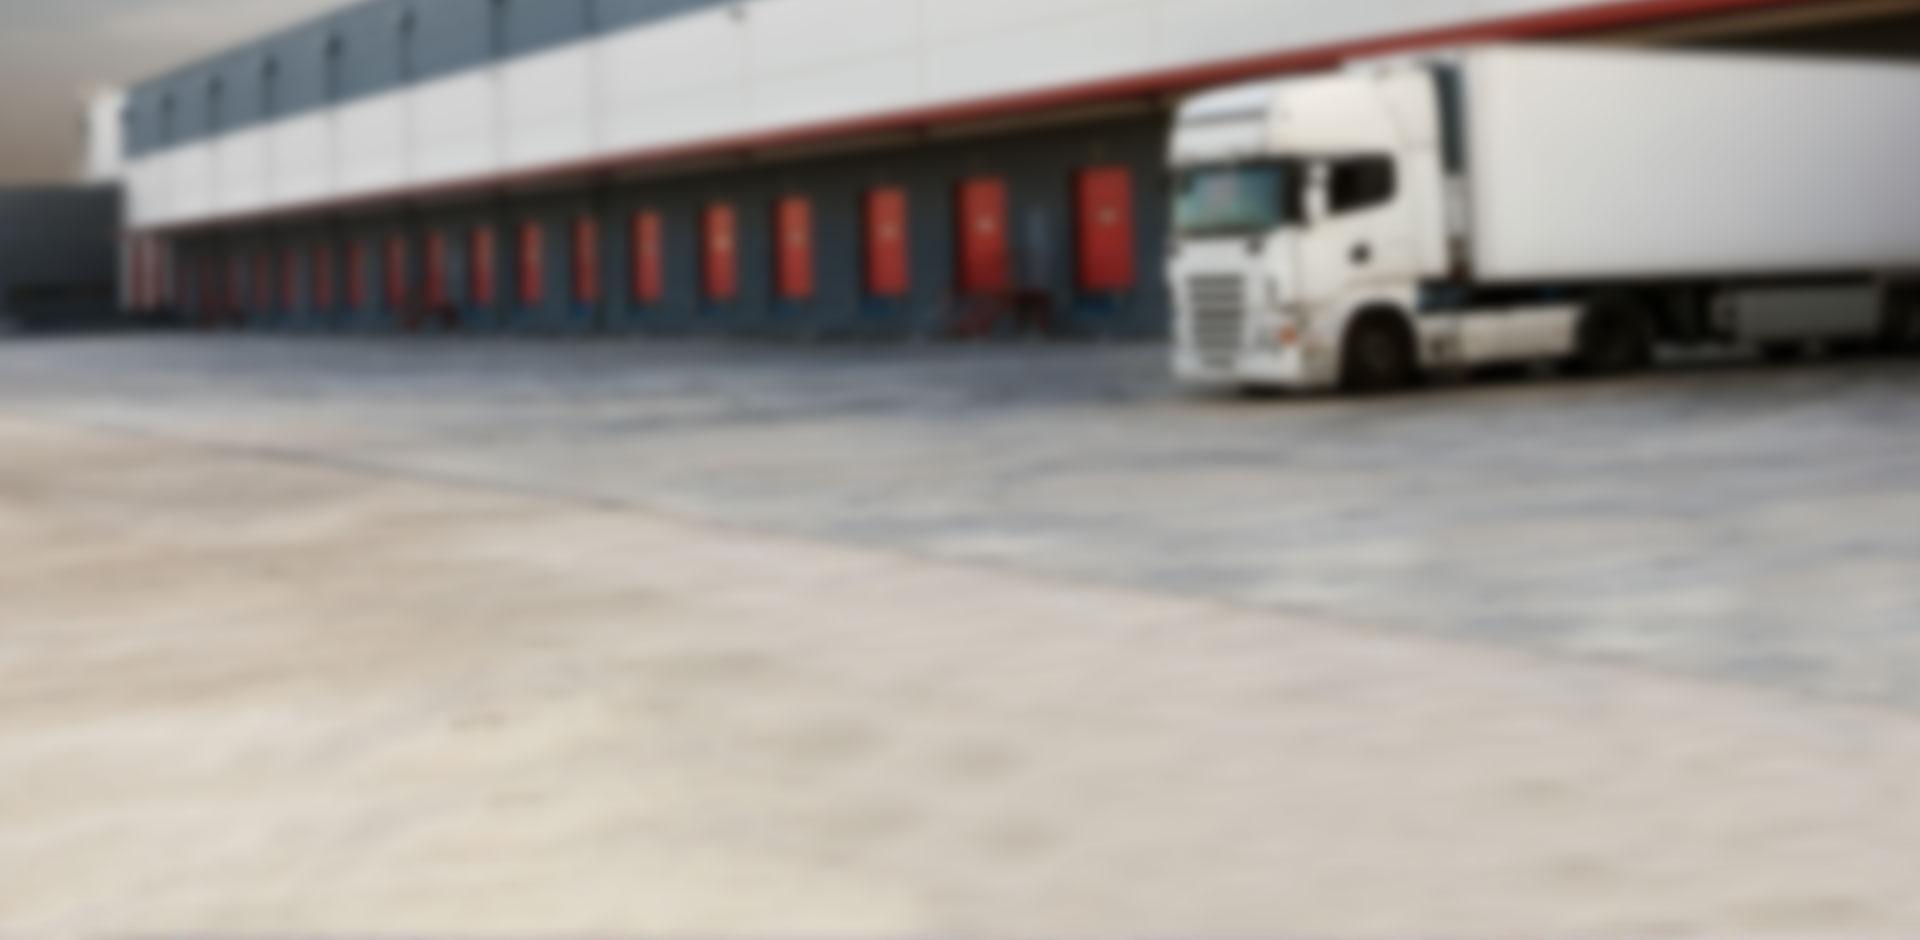 emploi transport et logistique